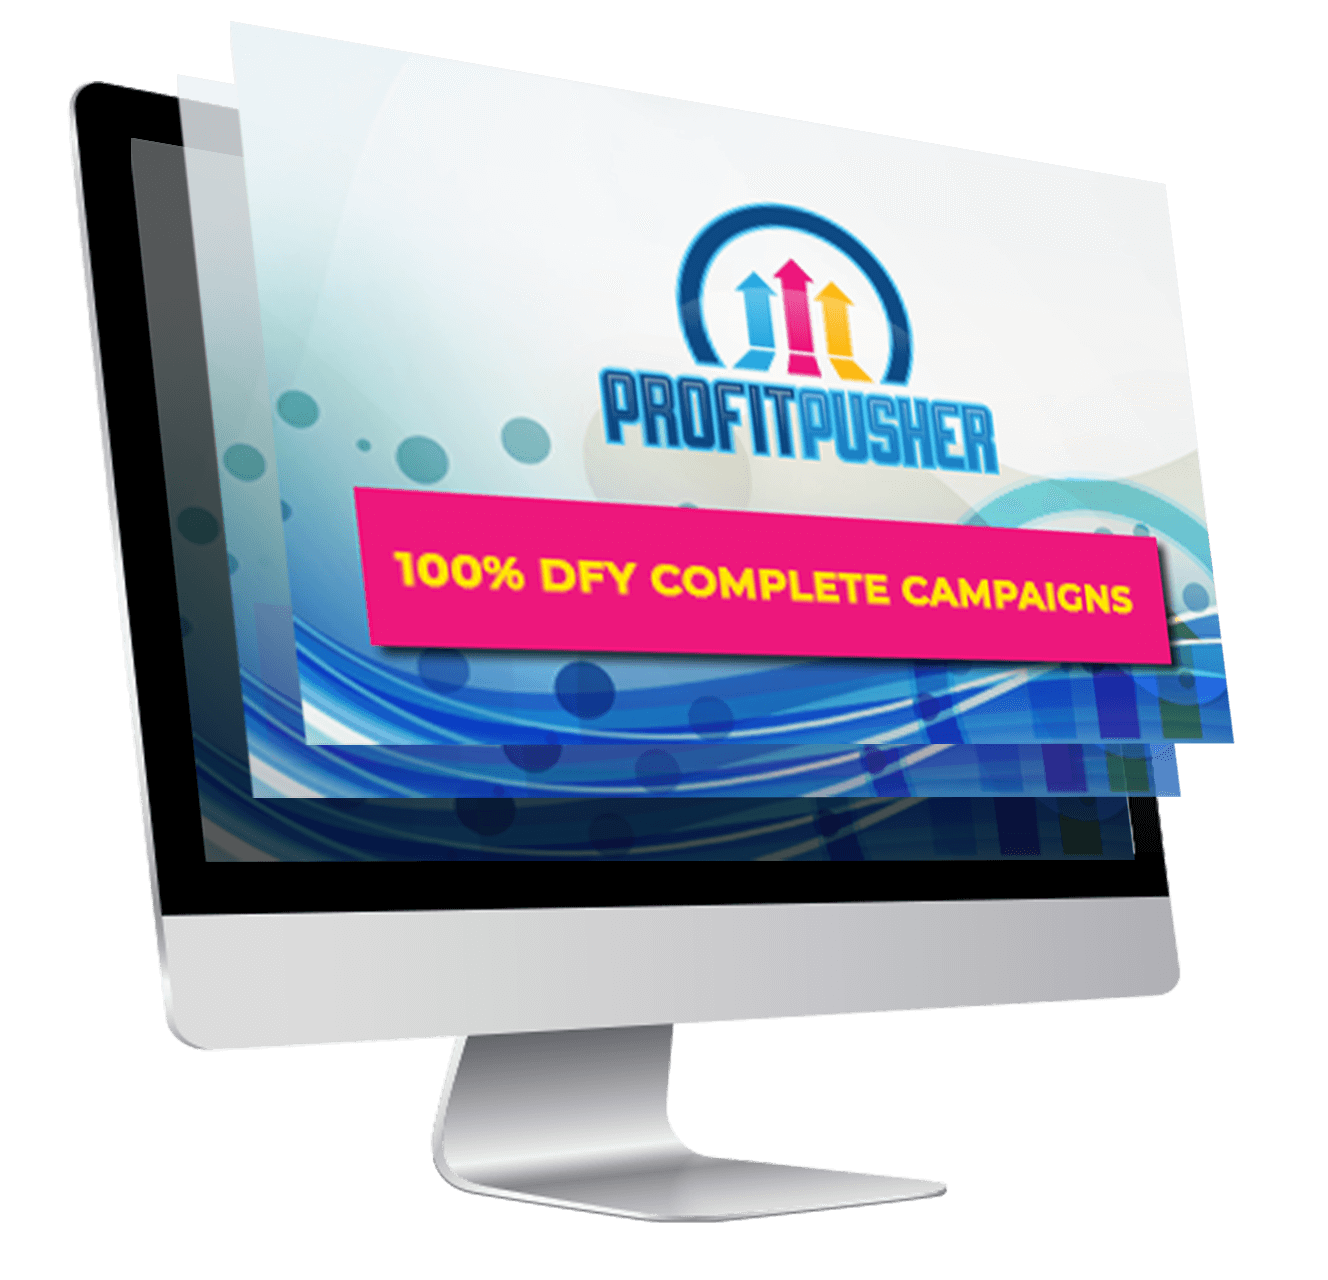 Profit-Pusher-feature-3